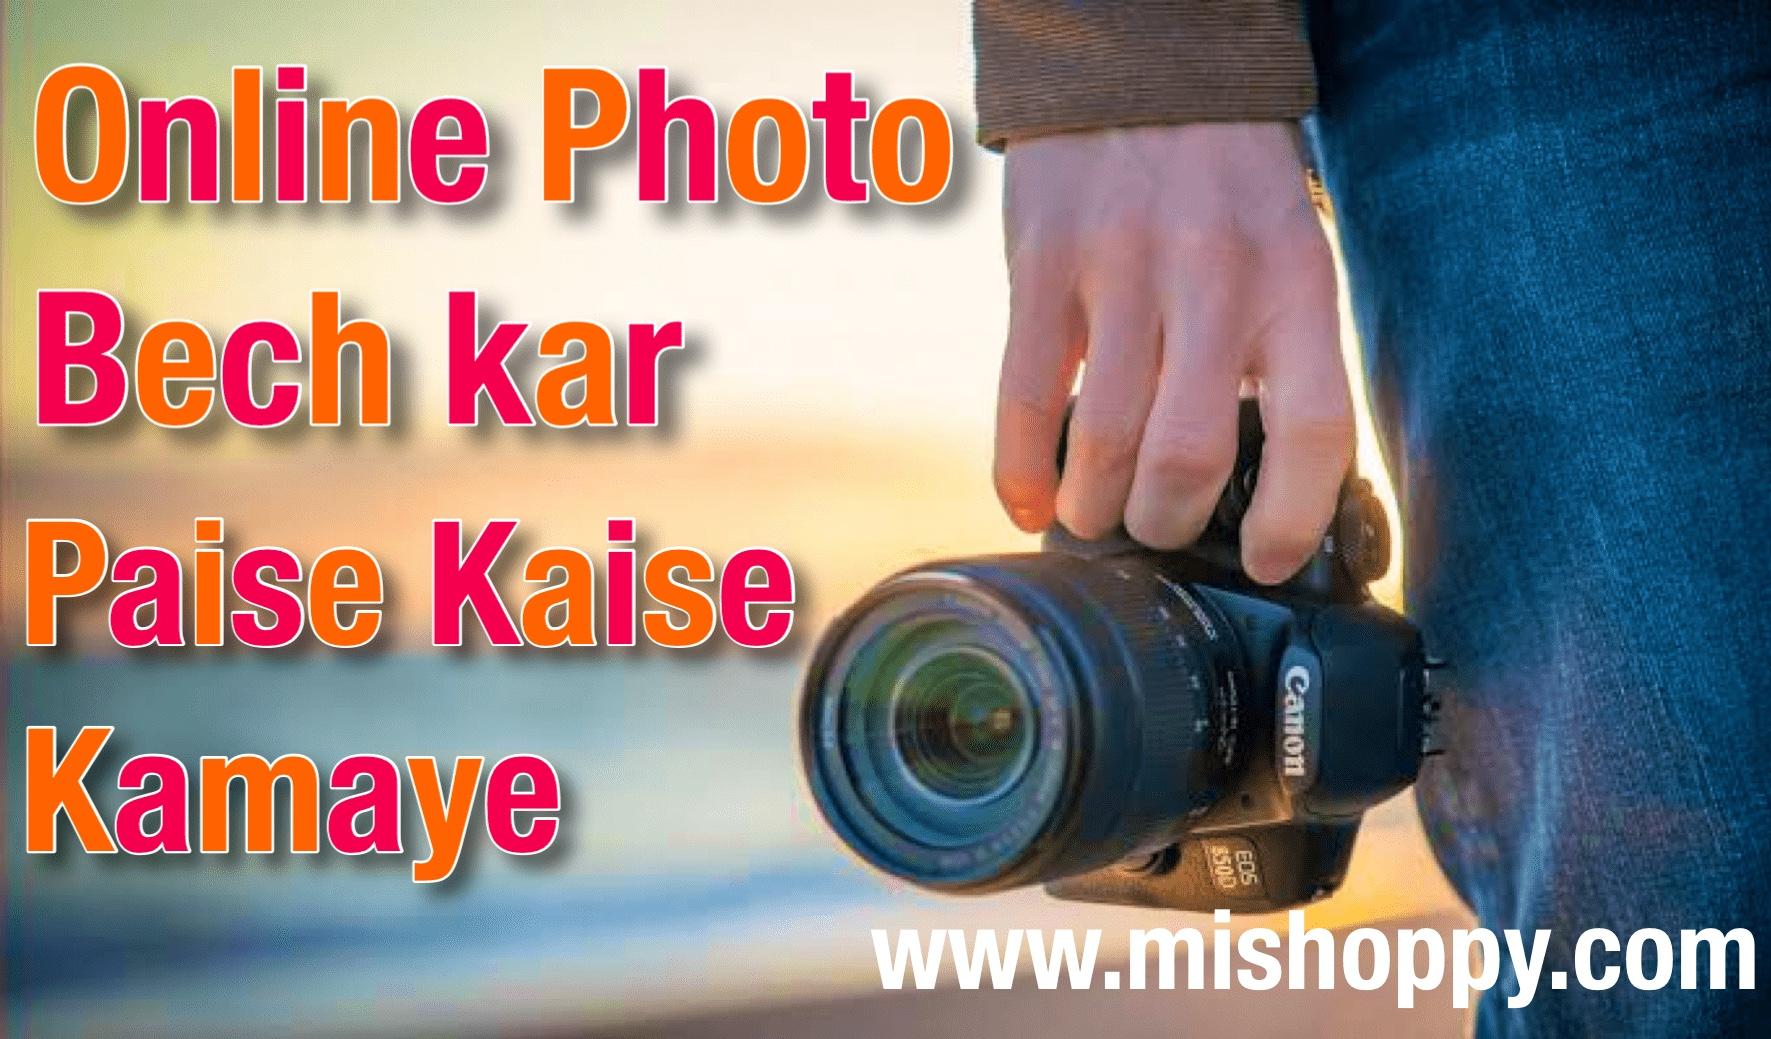 Online Photo Bechkar Paise kaise Kamaye - Photo Selling Website